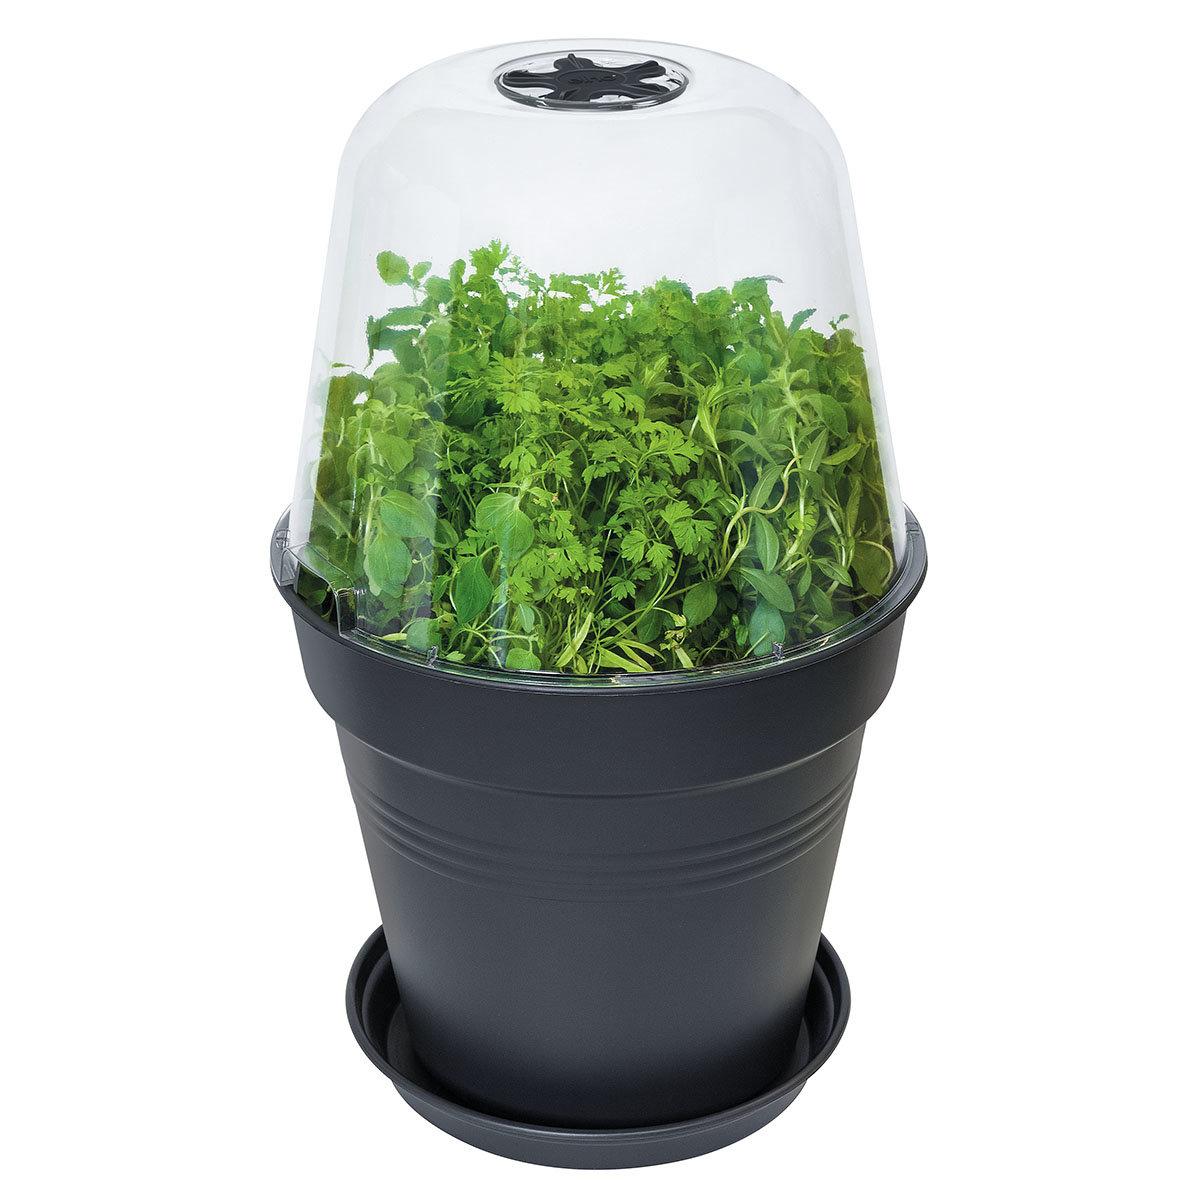 Anzucht-Pflanztopf Green Basics groß